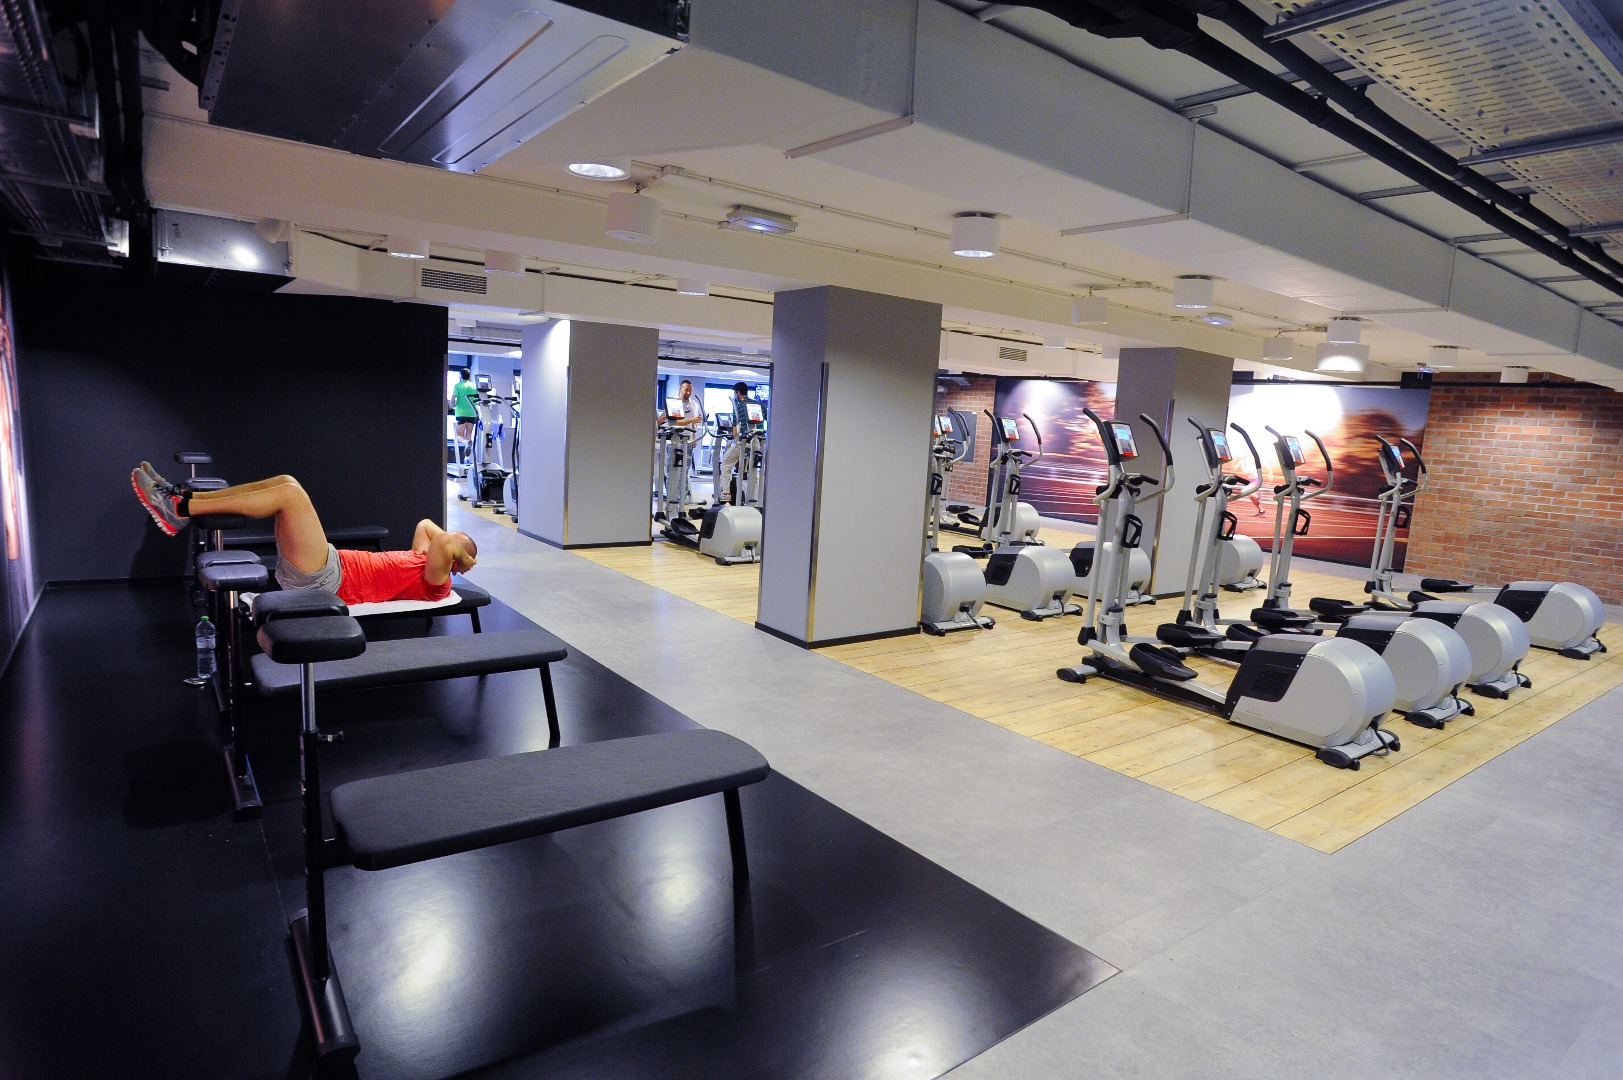 Picture 4 Deals for Gym McFIT Hospitalet - C.C La Farga L'Hospitalet de Llobregat